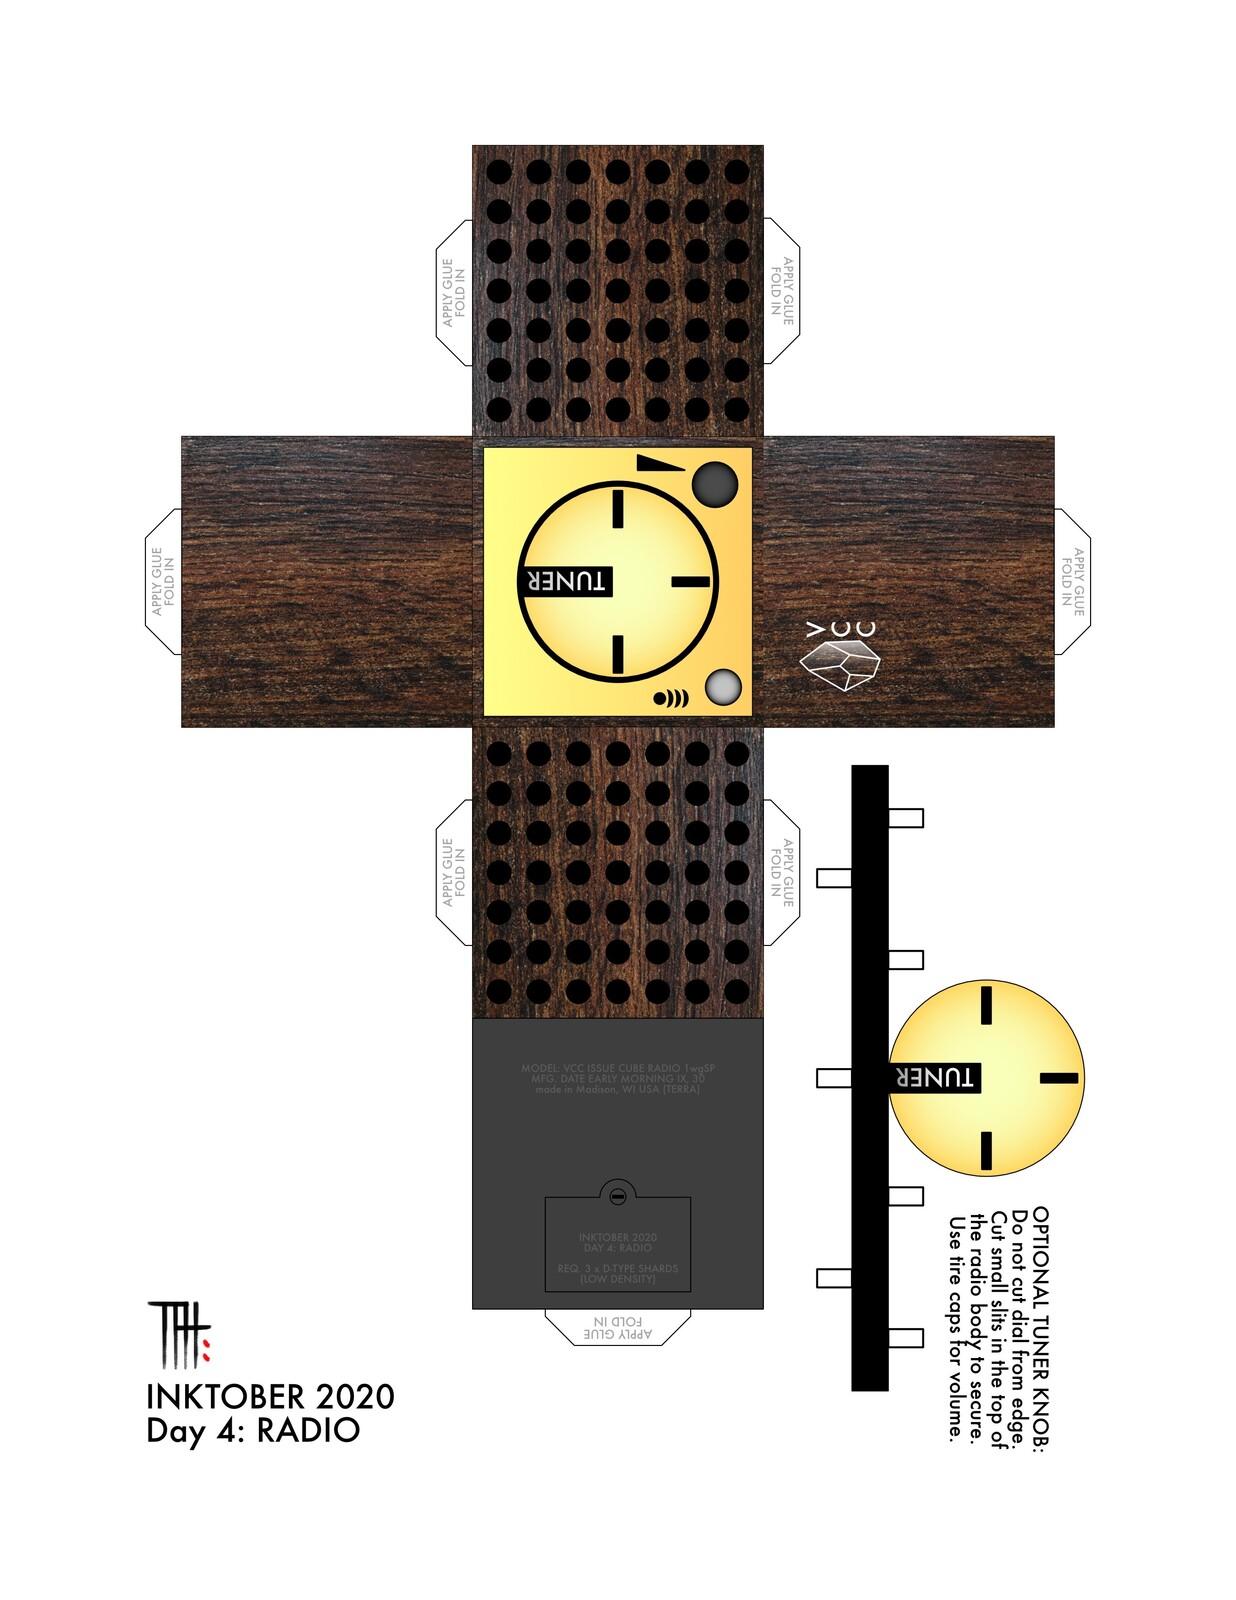 RADIO (woodgrain)  Affinity Designer